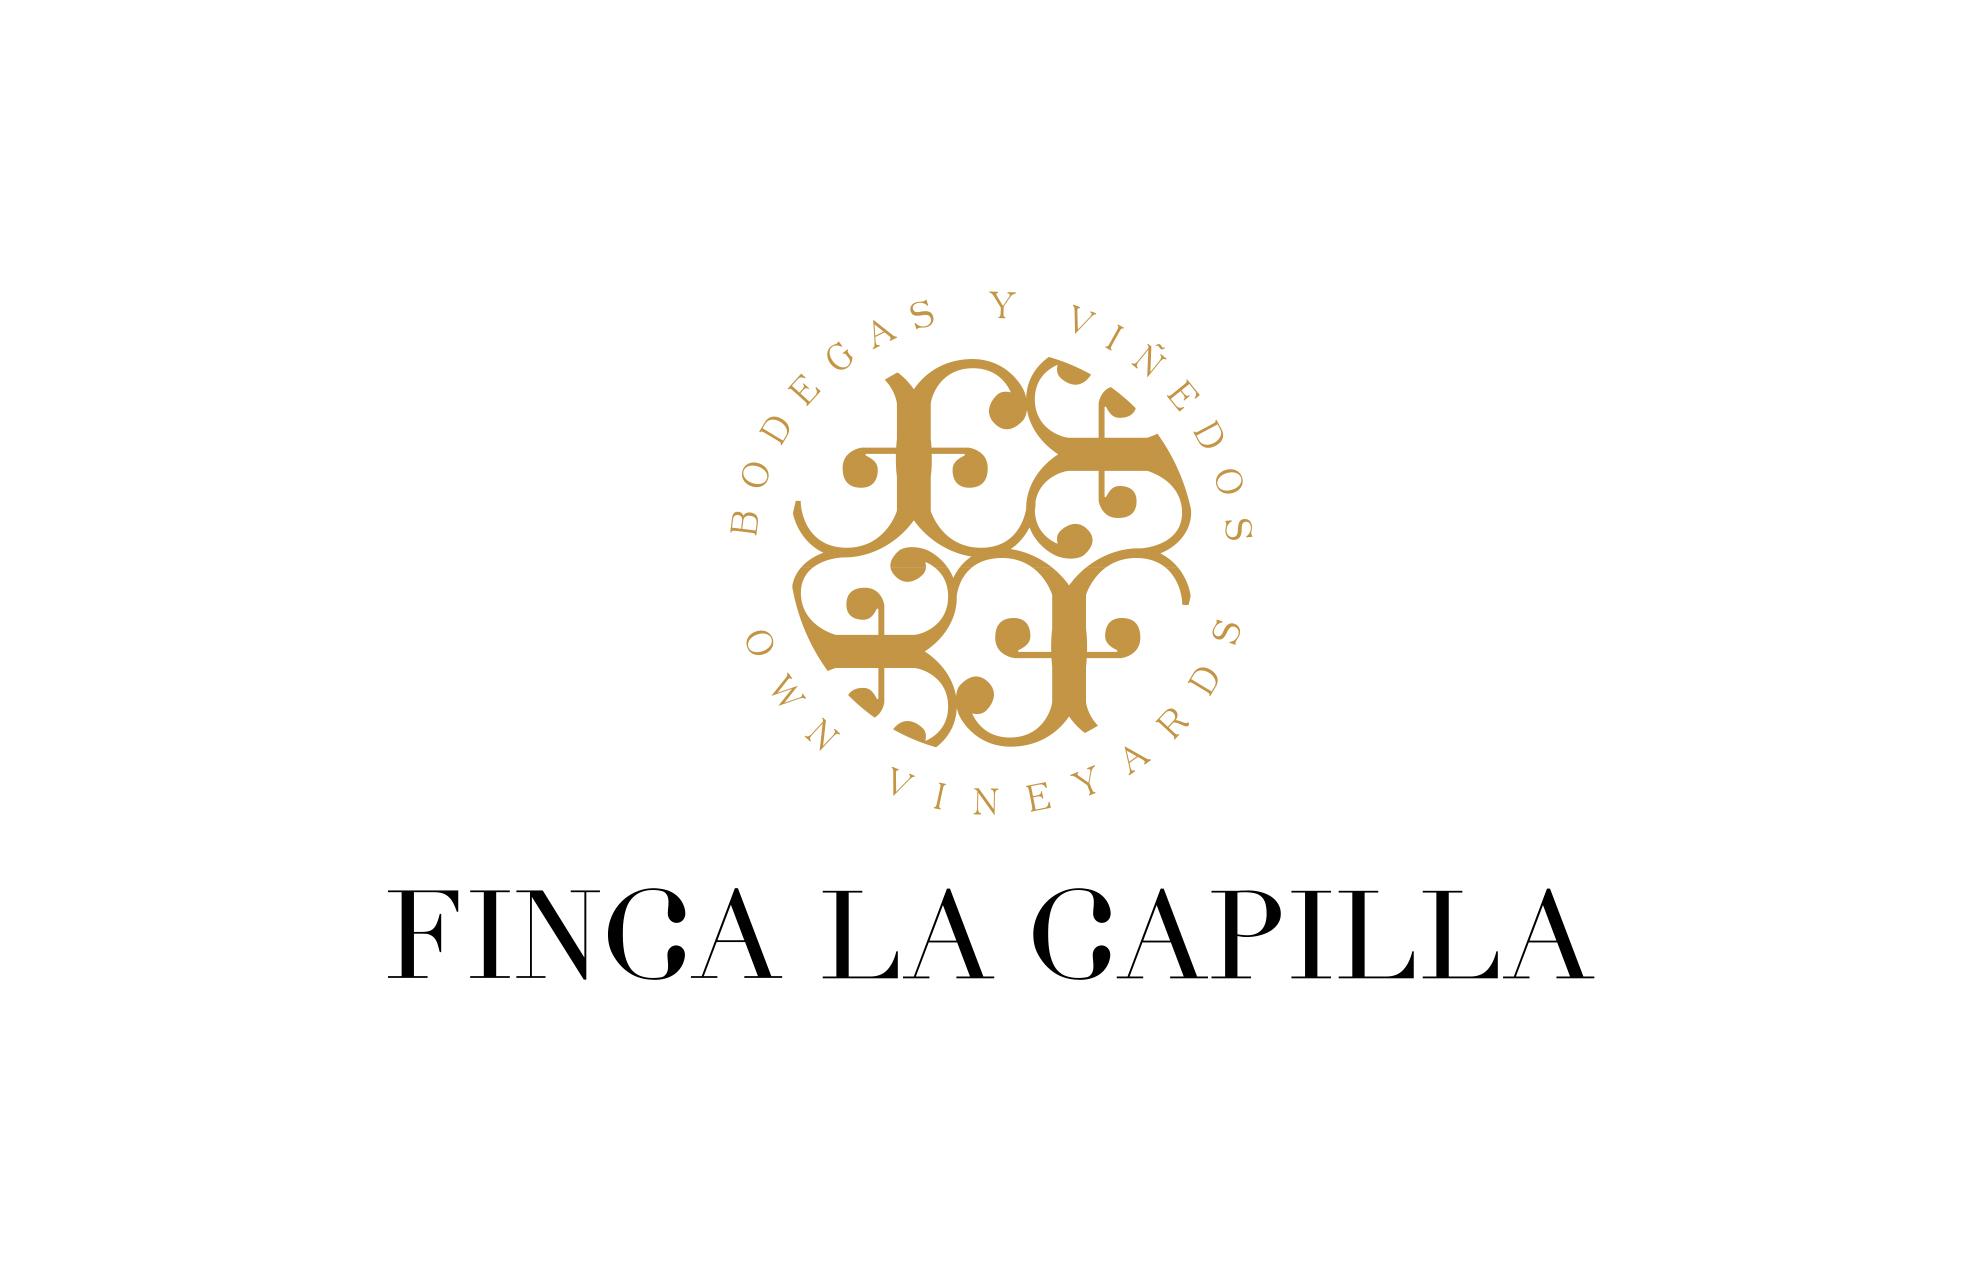 vyb_own_vineyards-finca_la_capilla-producto